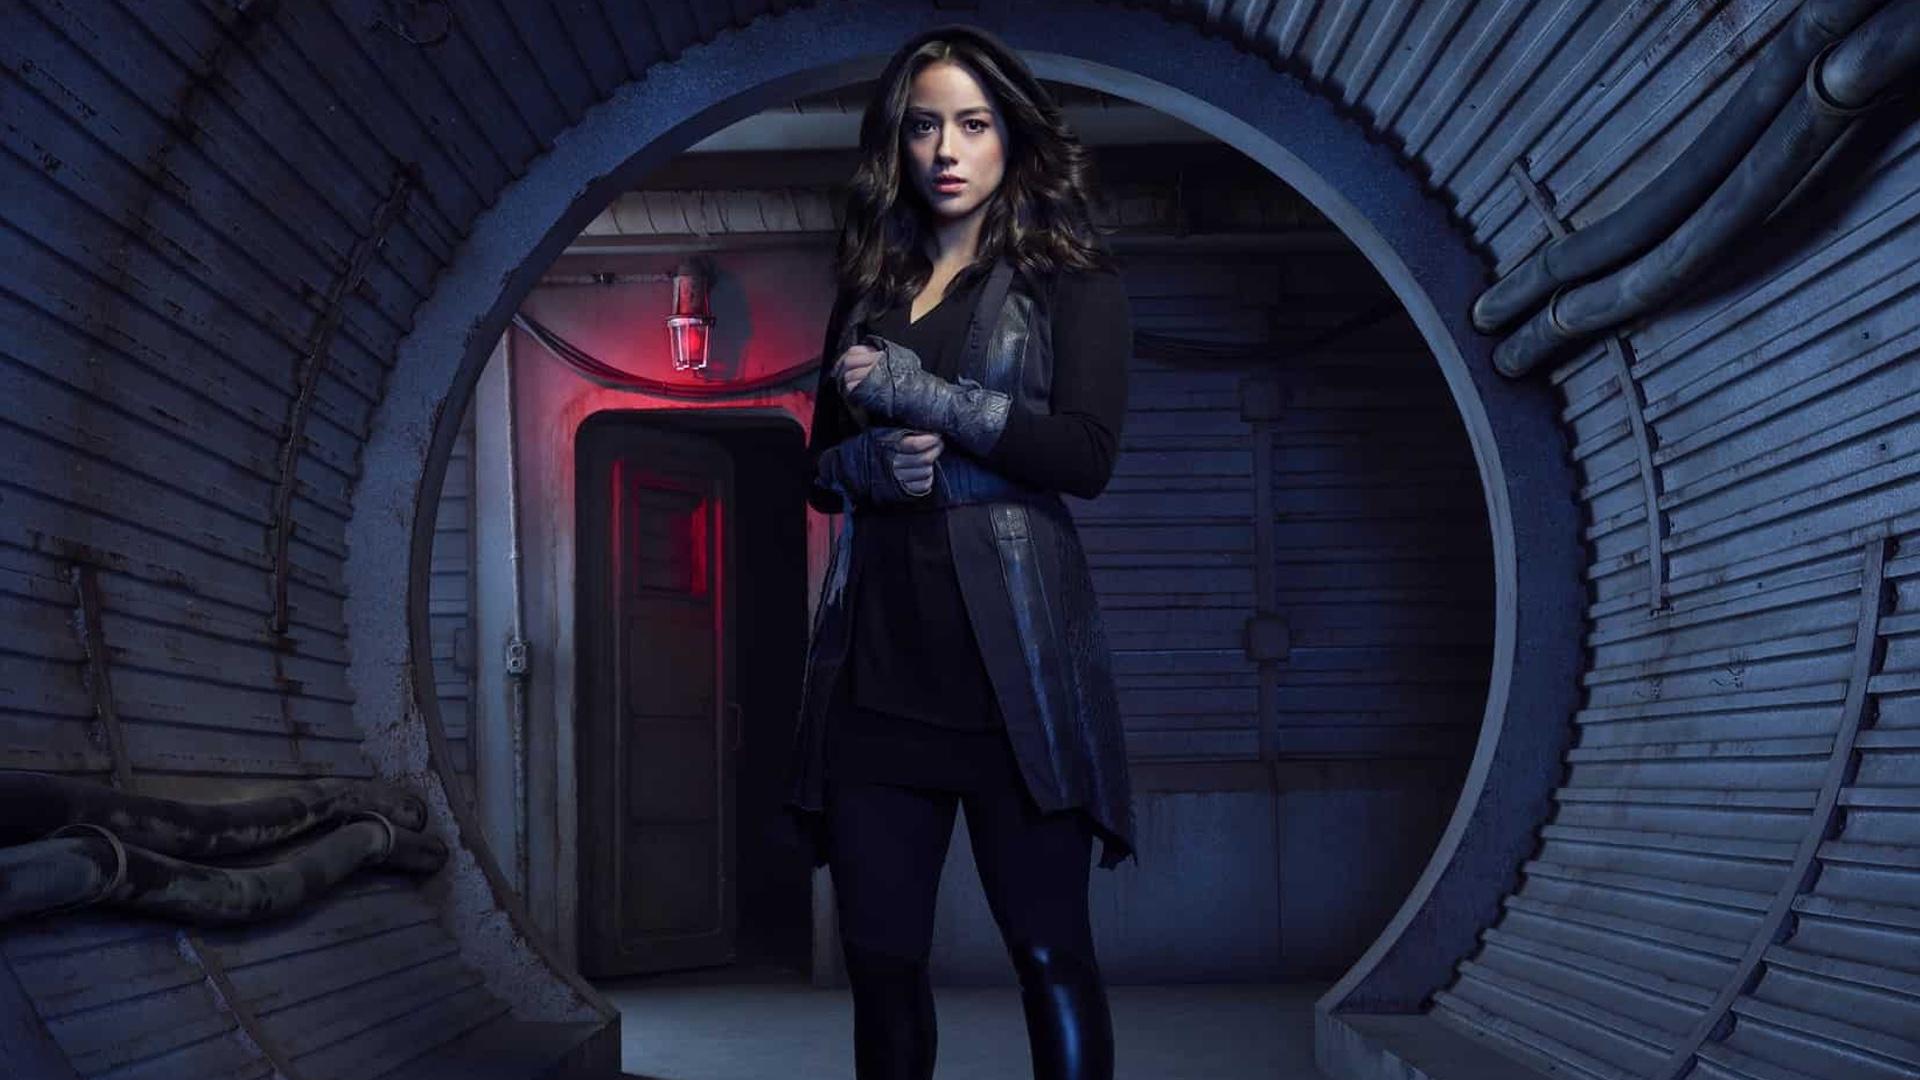 Agents of S.H.I.E.L.D Season 7 Will Be The Final Season